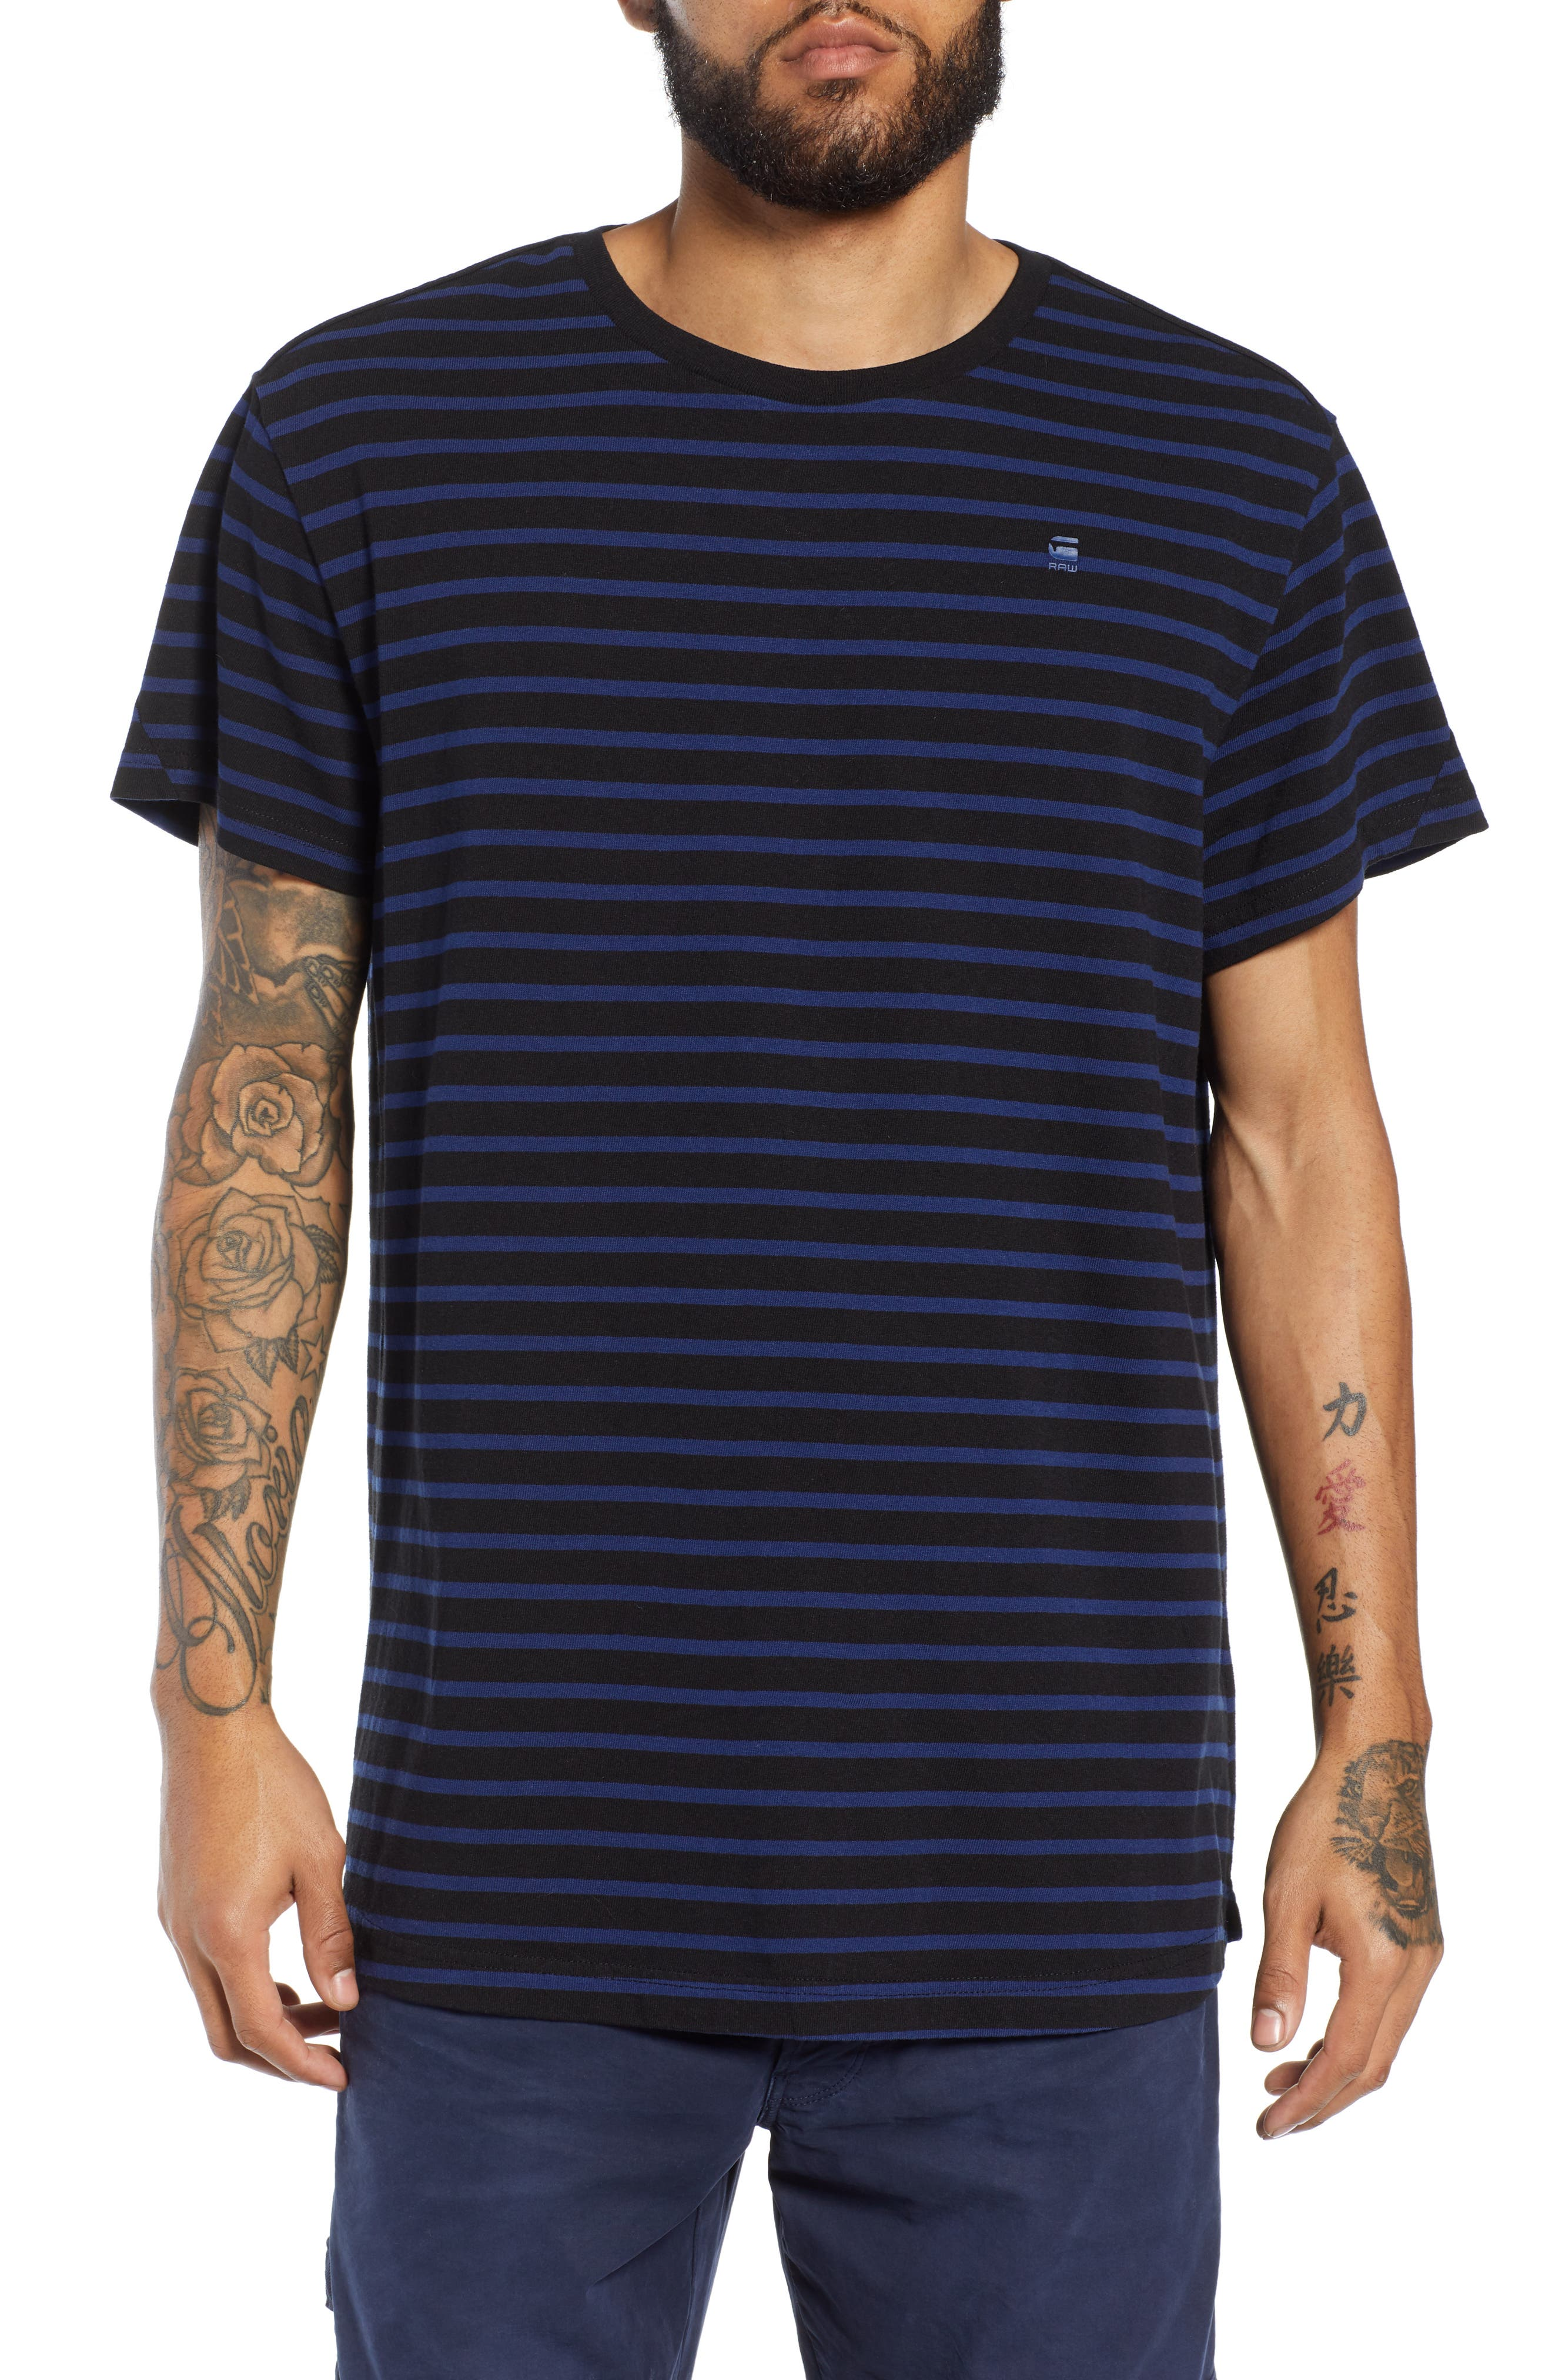 G-STAR RAW Starkon Stripe T-Shirt in Dark Black/ Imperial Blue